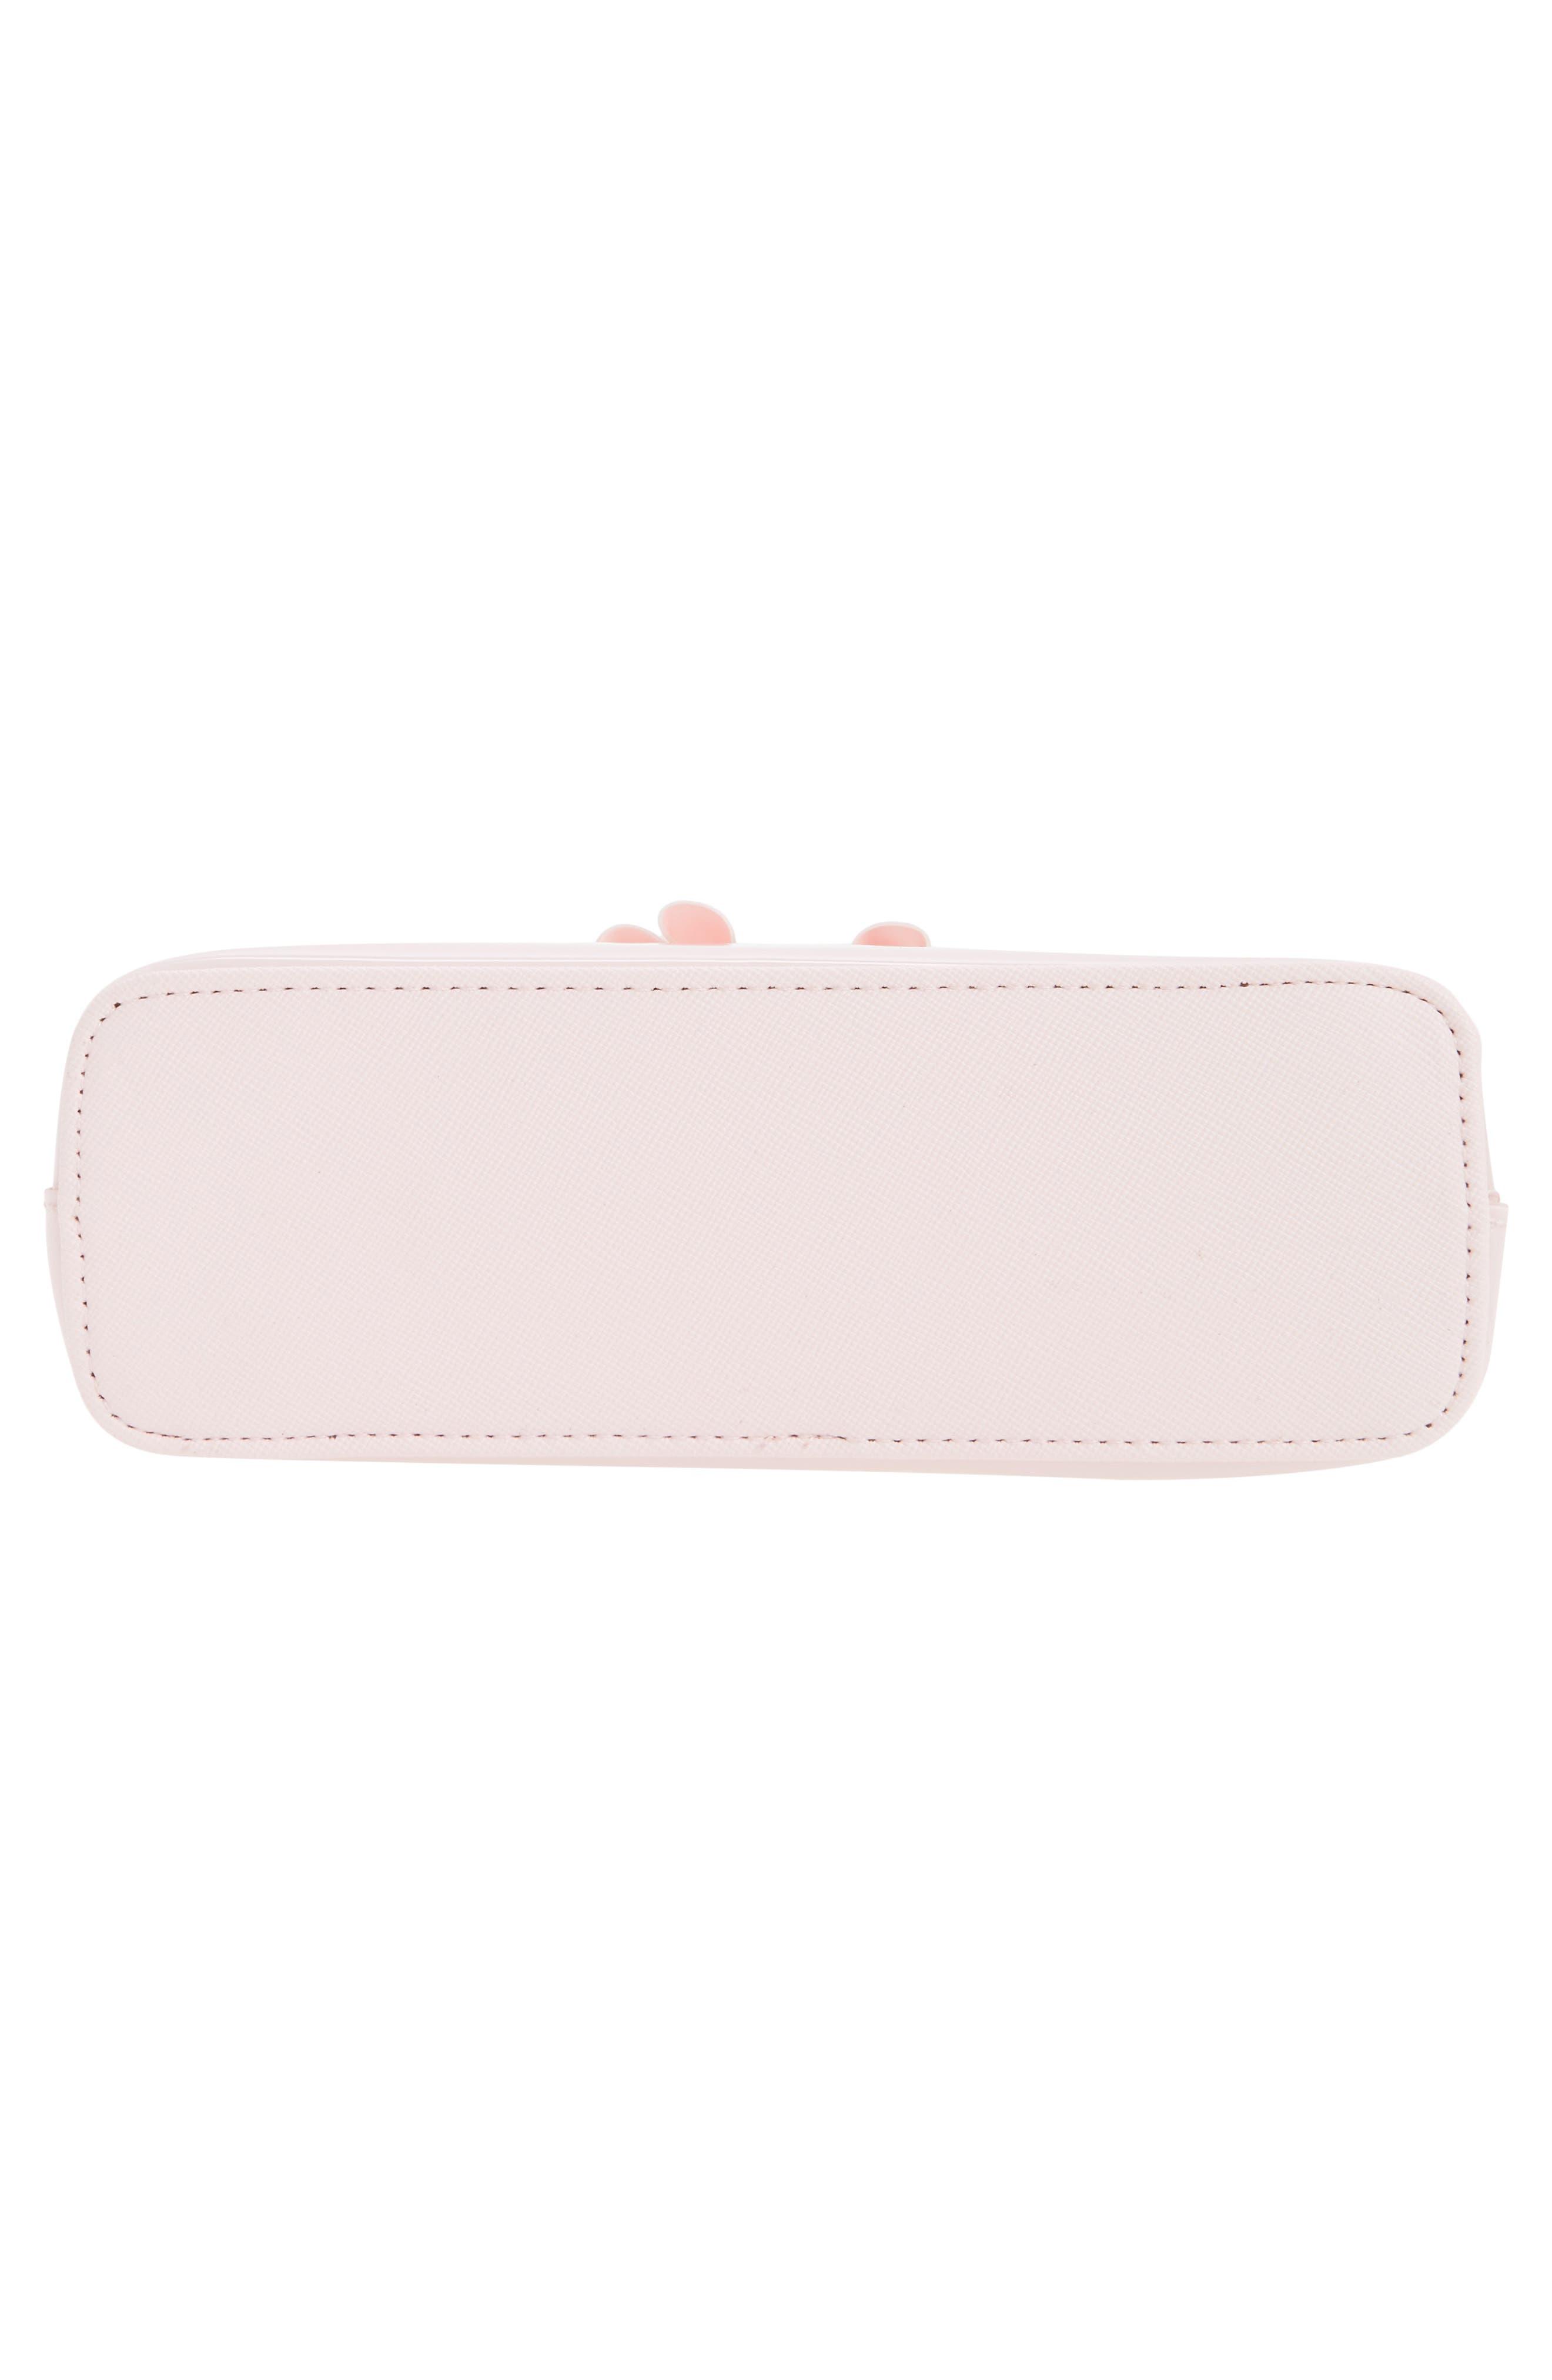 Julis Bow PVC Cosmetics Case,                             Alternate thumbnail 5, color,                             652